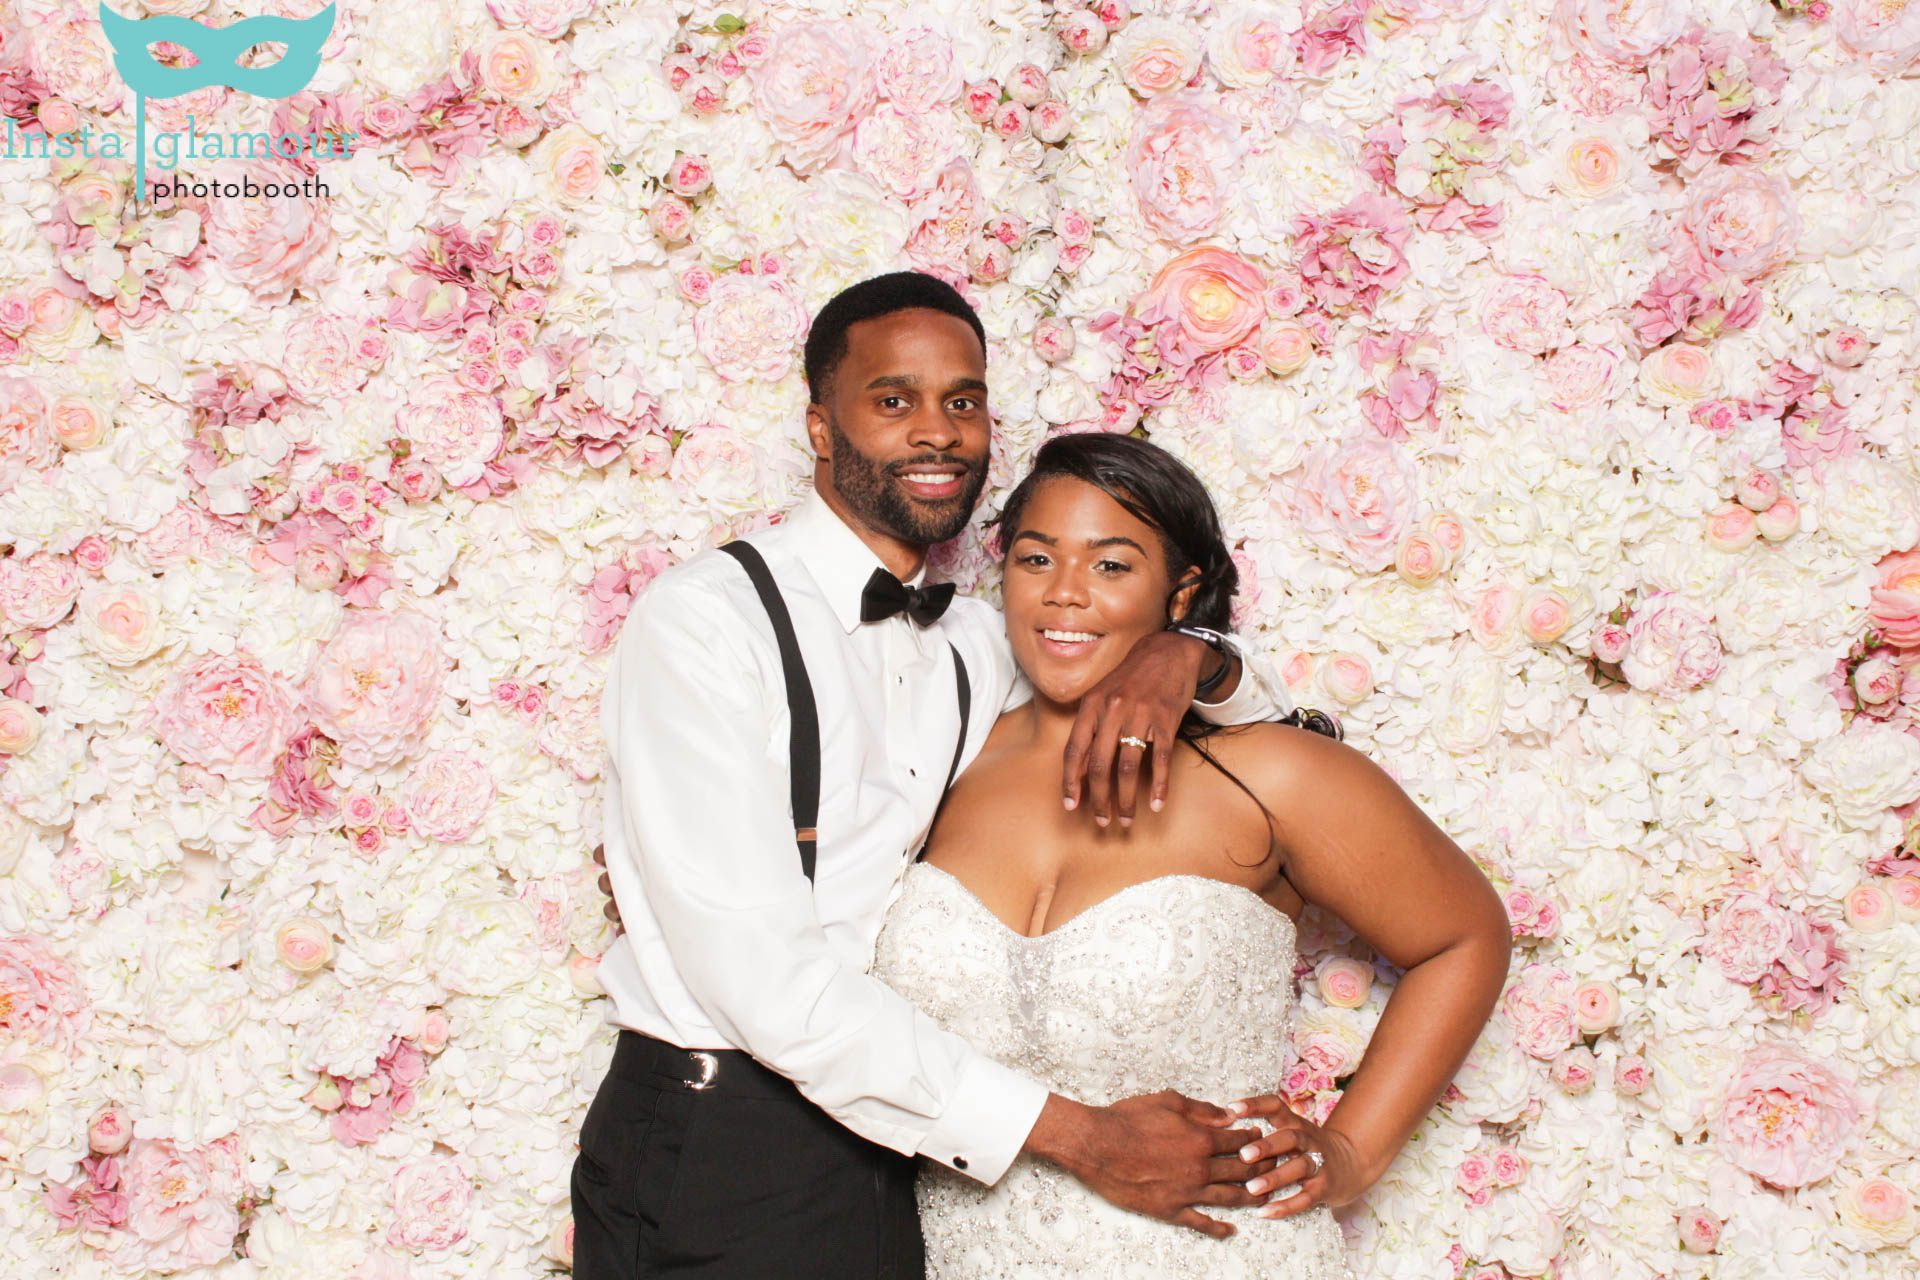 Ashley Rodney Wedding Tendenza Philadelphia Photo Booth Rental Instaglamour Photobooth,Wedding Guest Purple Plus Size Dress